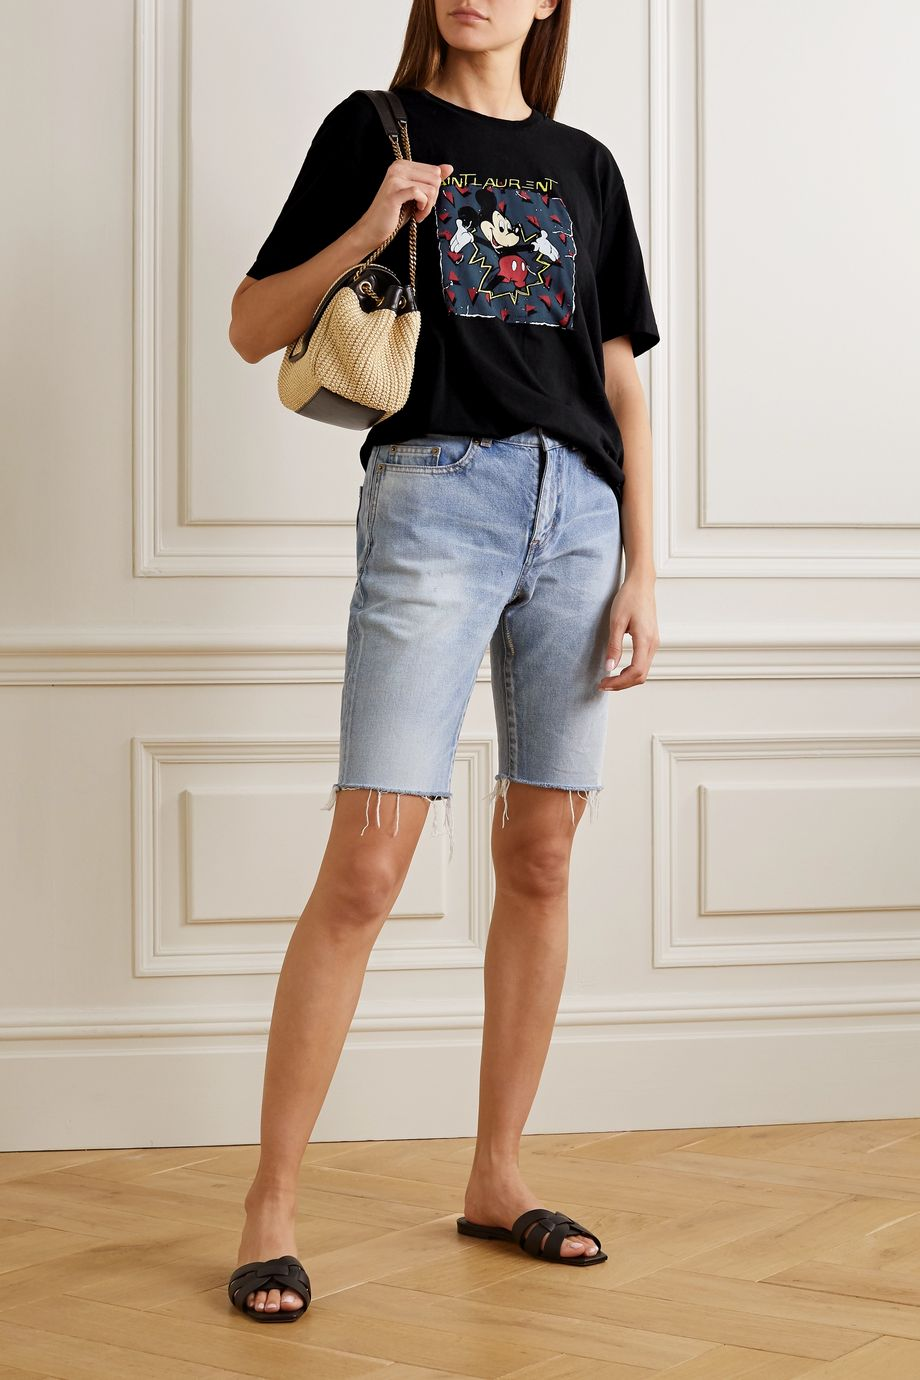 SAINT LAURENT + Disney printed cotton-jersey T-shirt